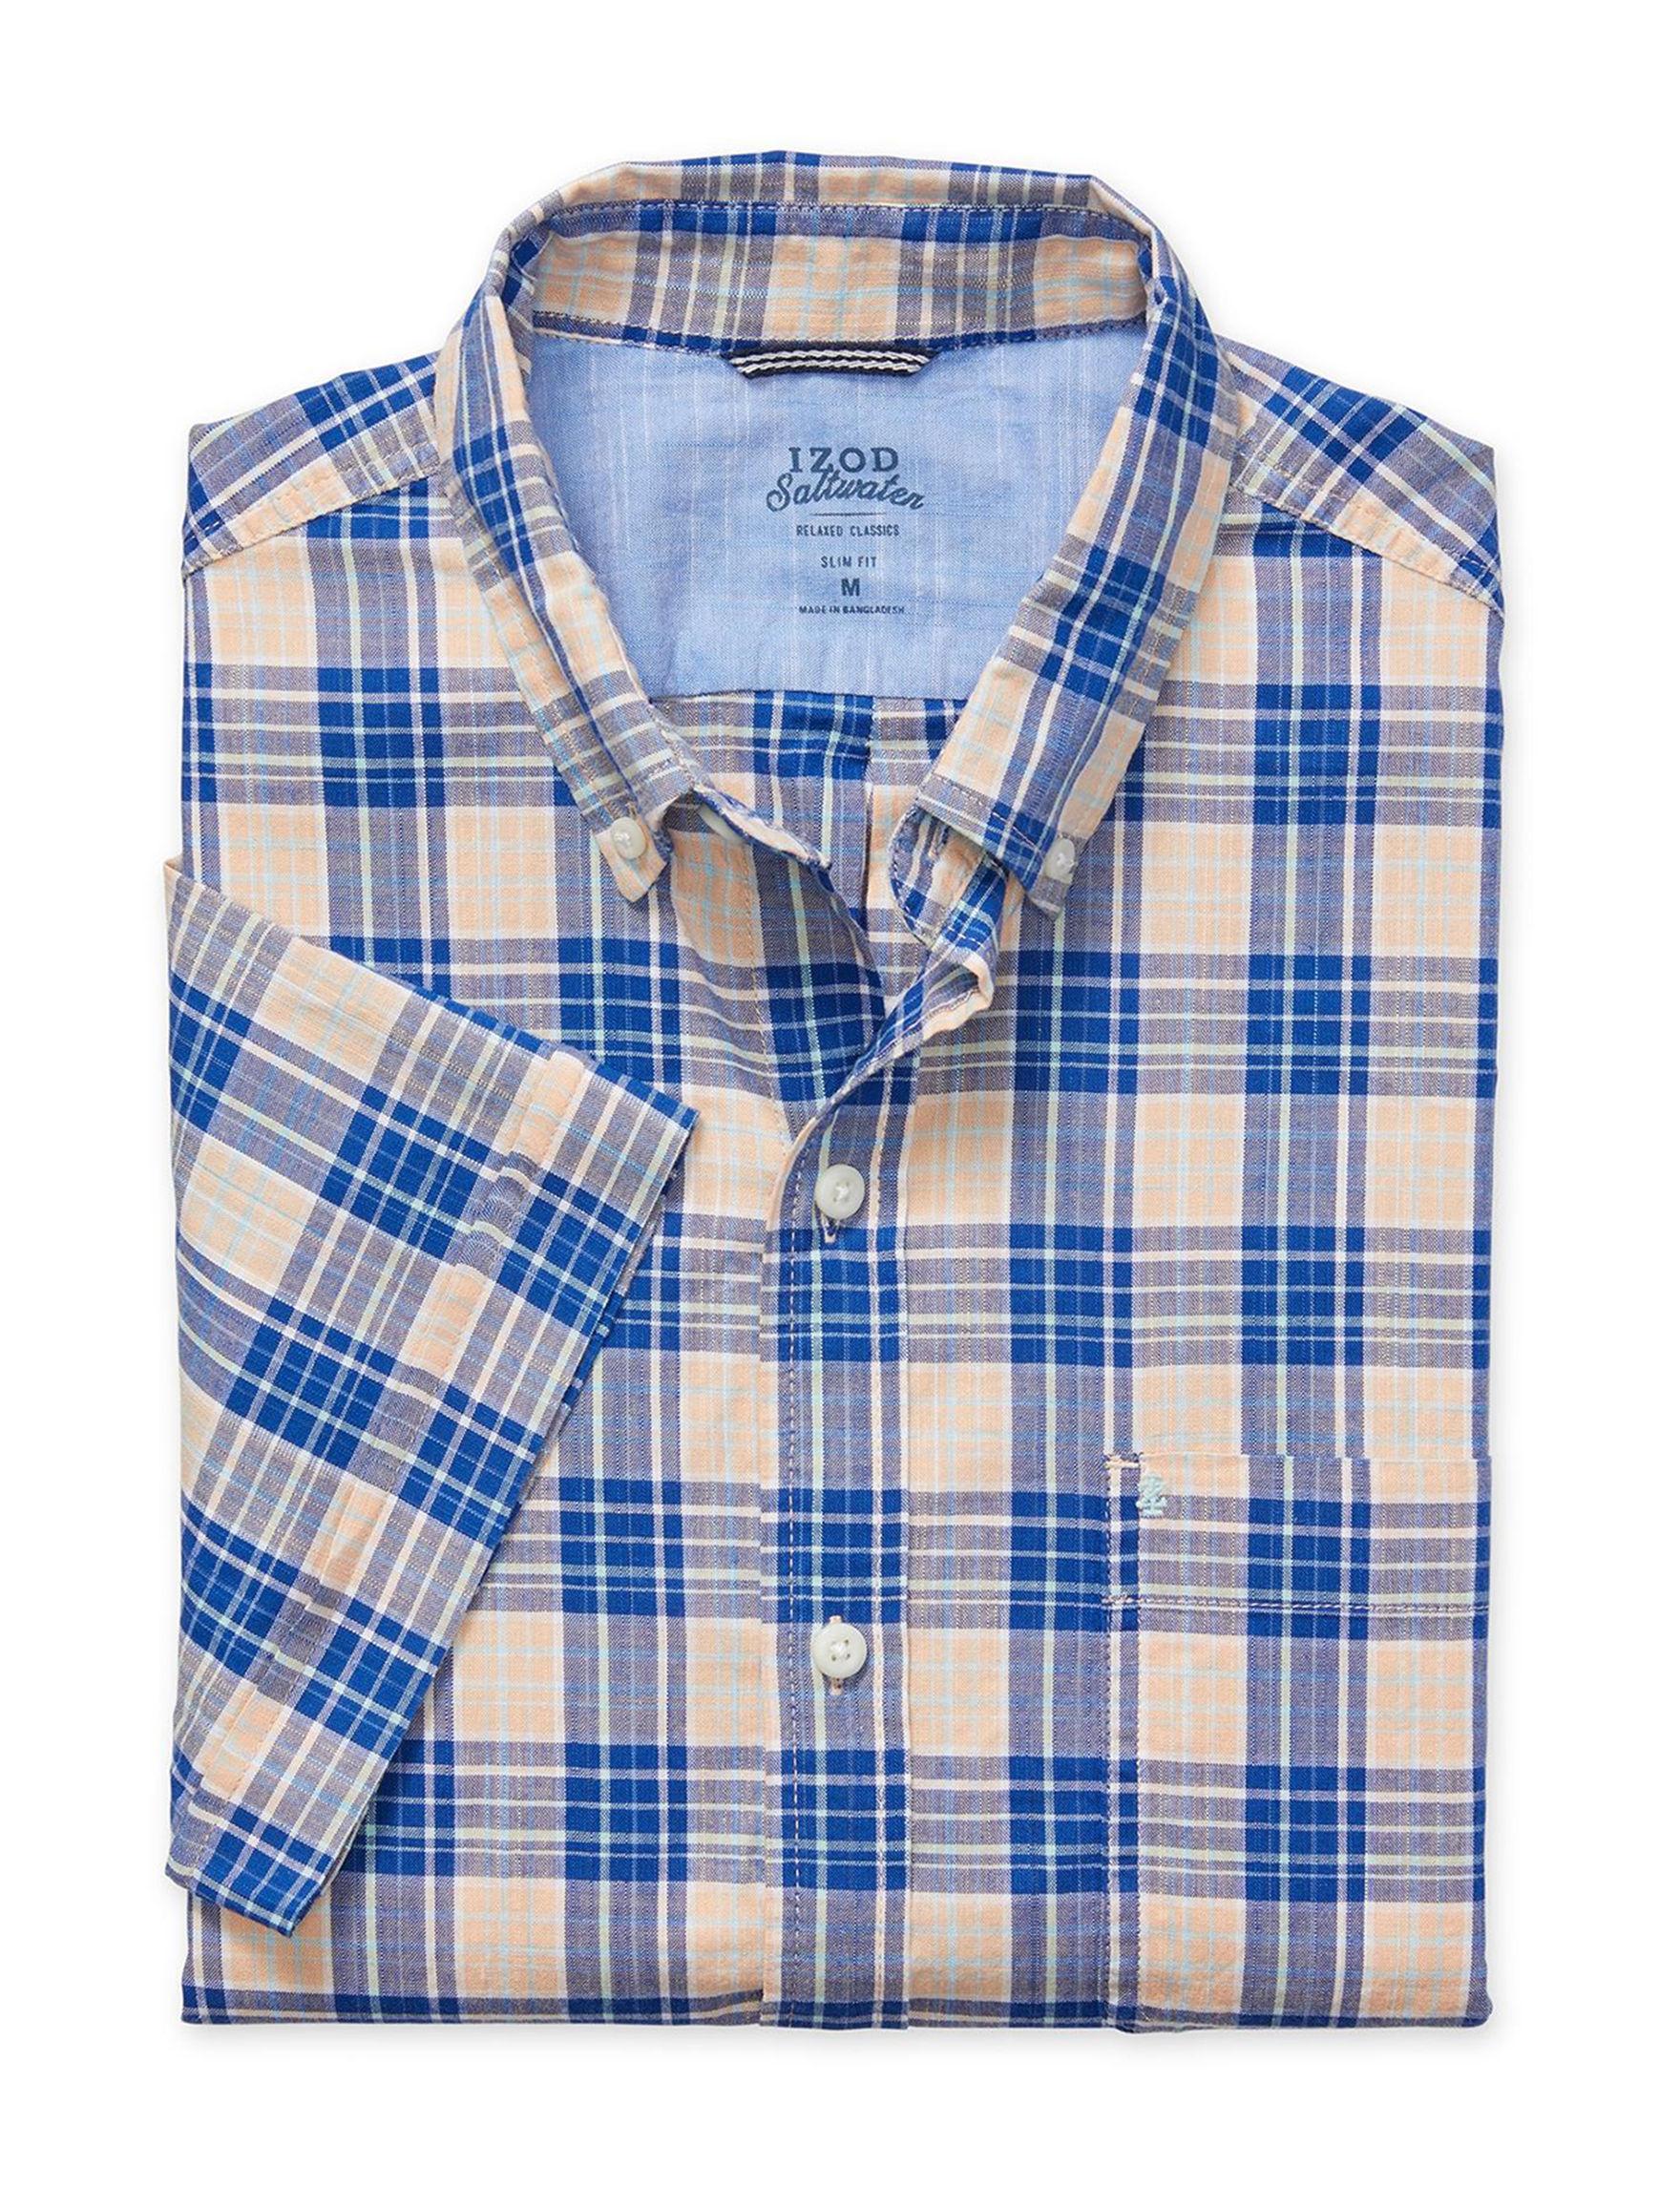 Izod Blue / Plaid Casual Button Down Shirts